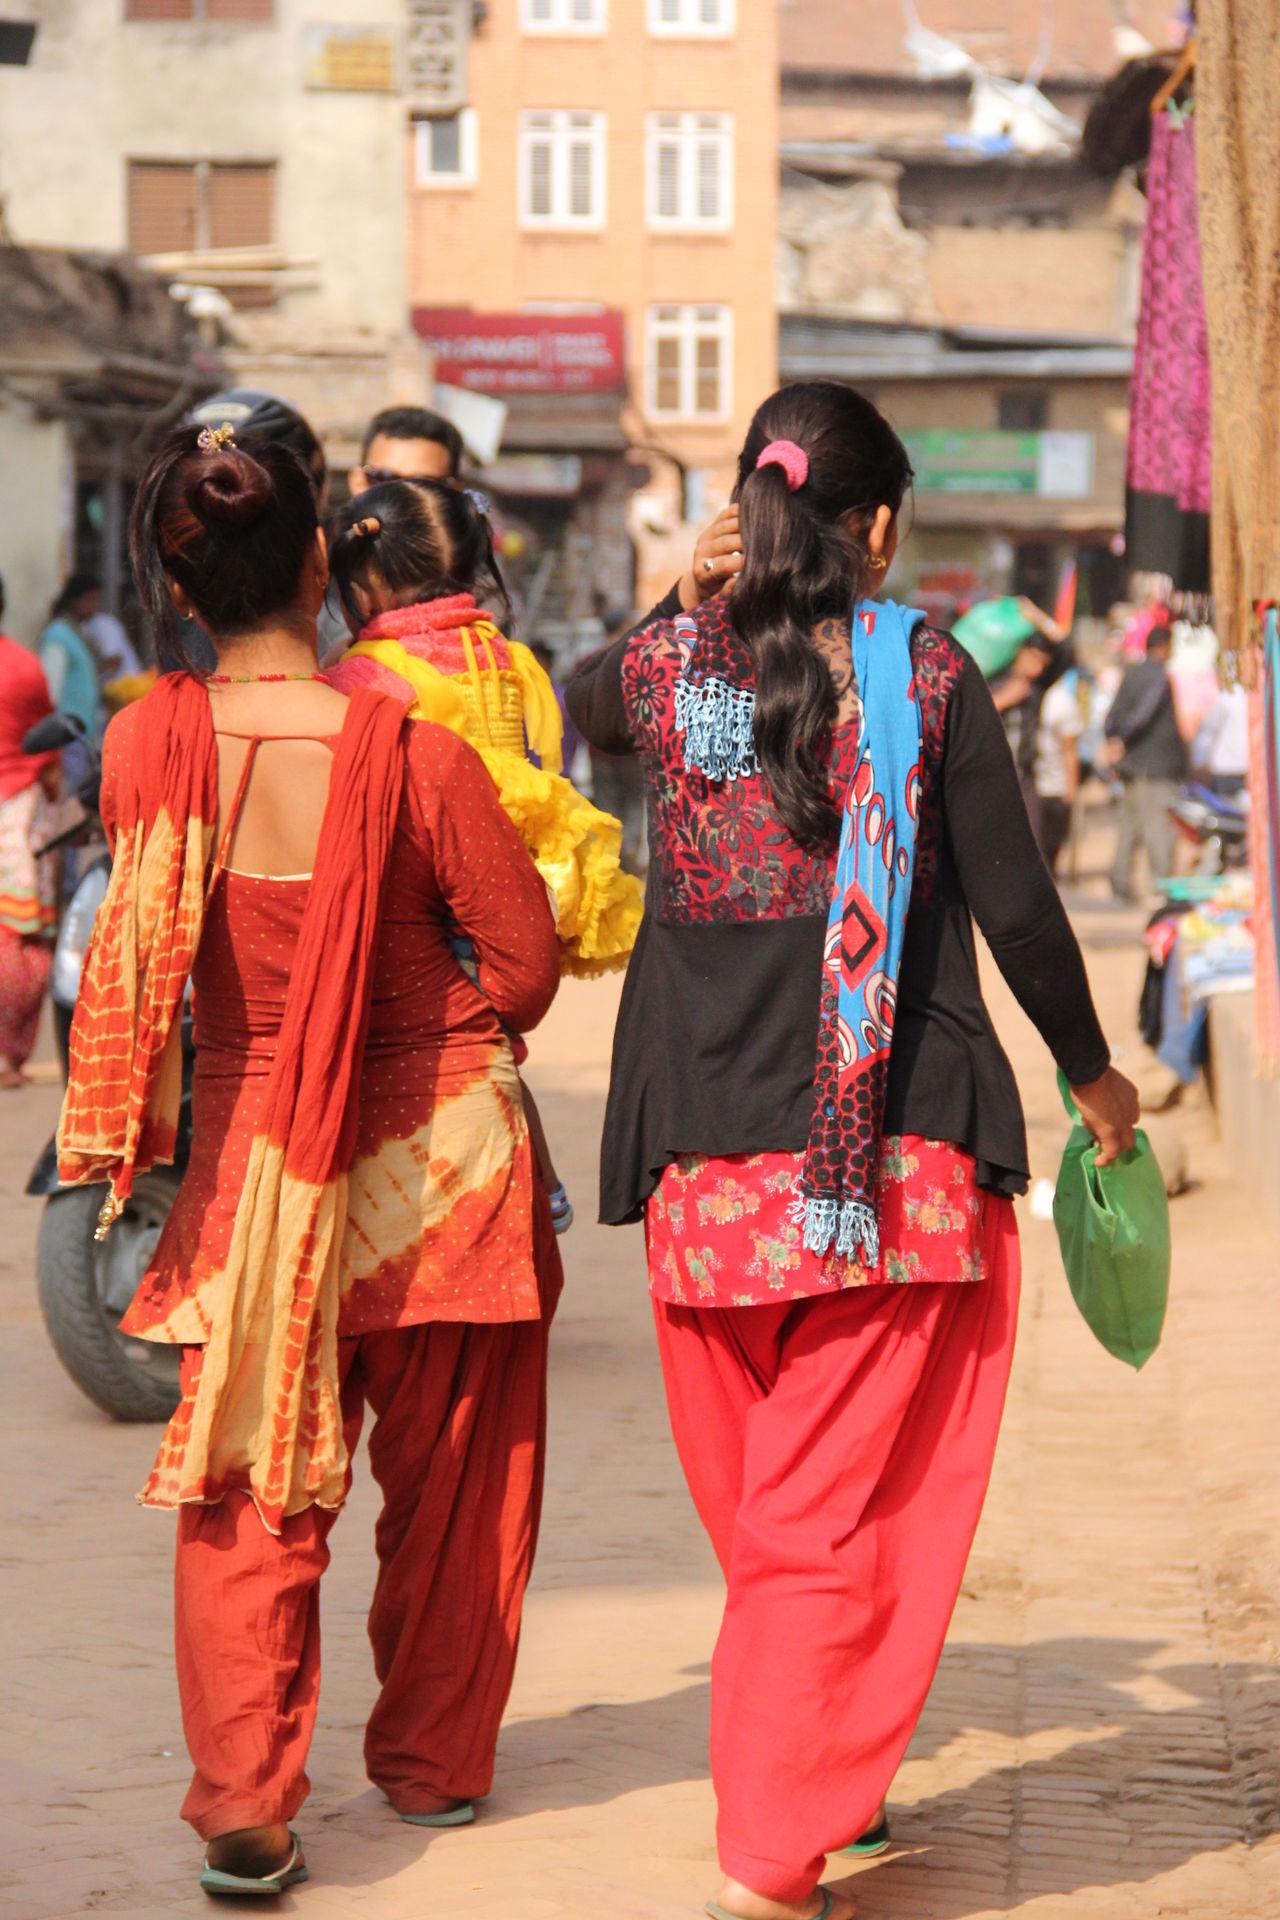 Street Women Traditional Clothing Nepalipeople😊 nepal travel